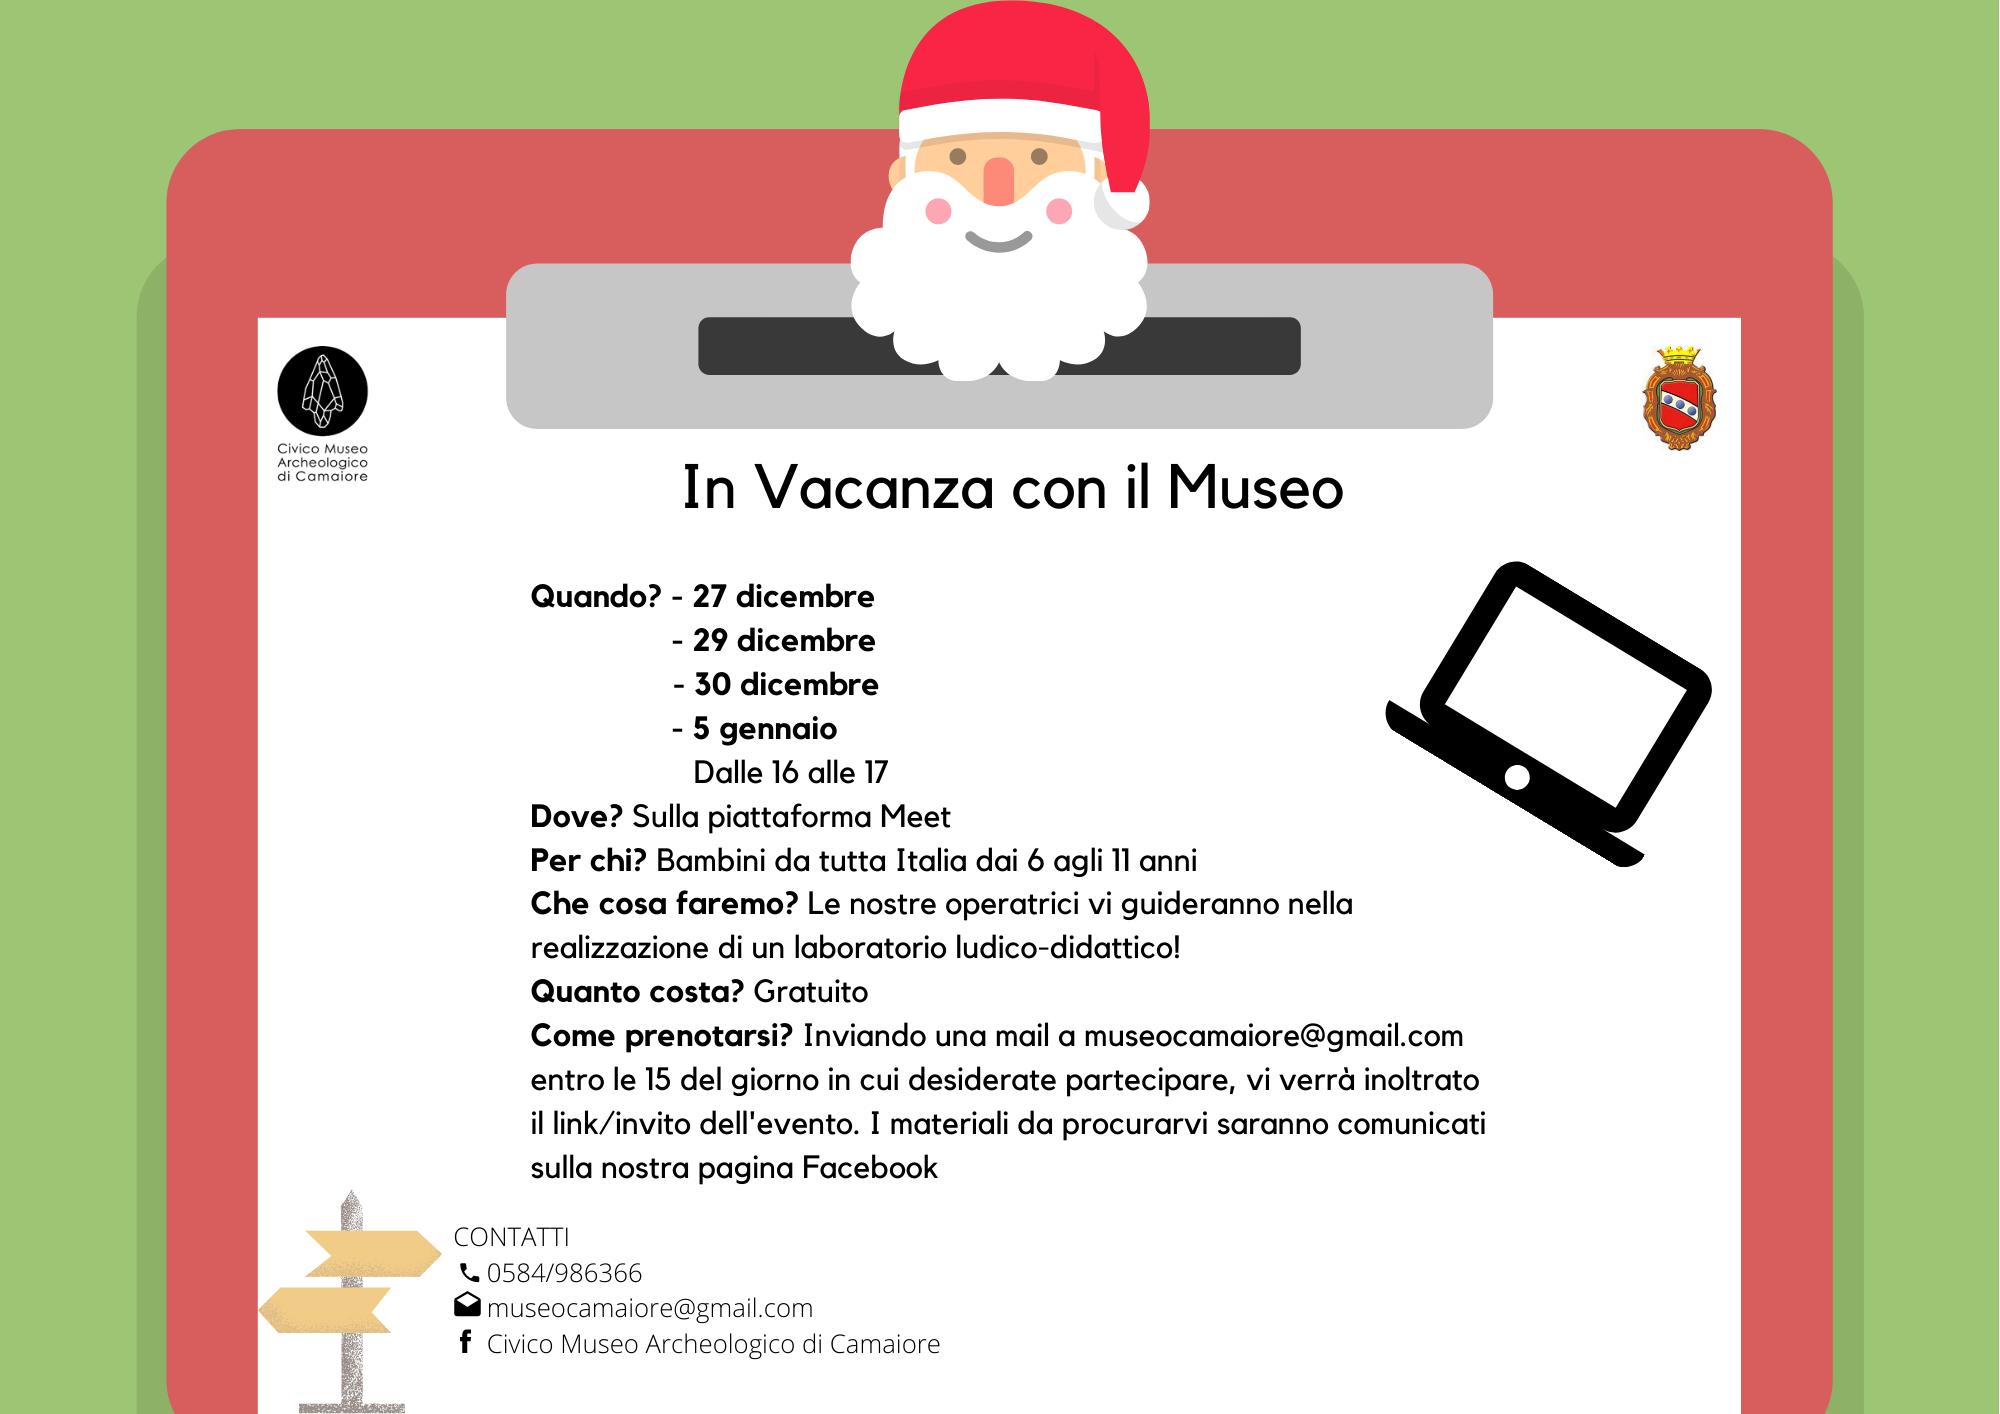 http://www.icom-italia.org/wp-content/uploads/wpforms/10320-346379fc8433371d8ed056fee97d2a28/natale-lab-dec4d0275bba201c79780986c0de59c0.png